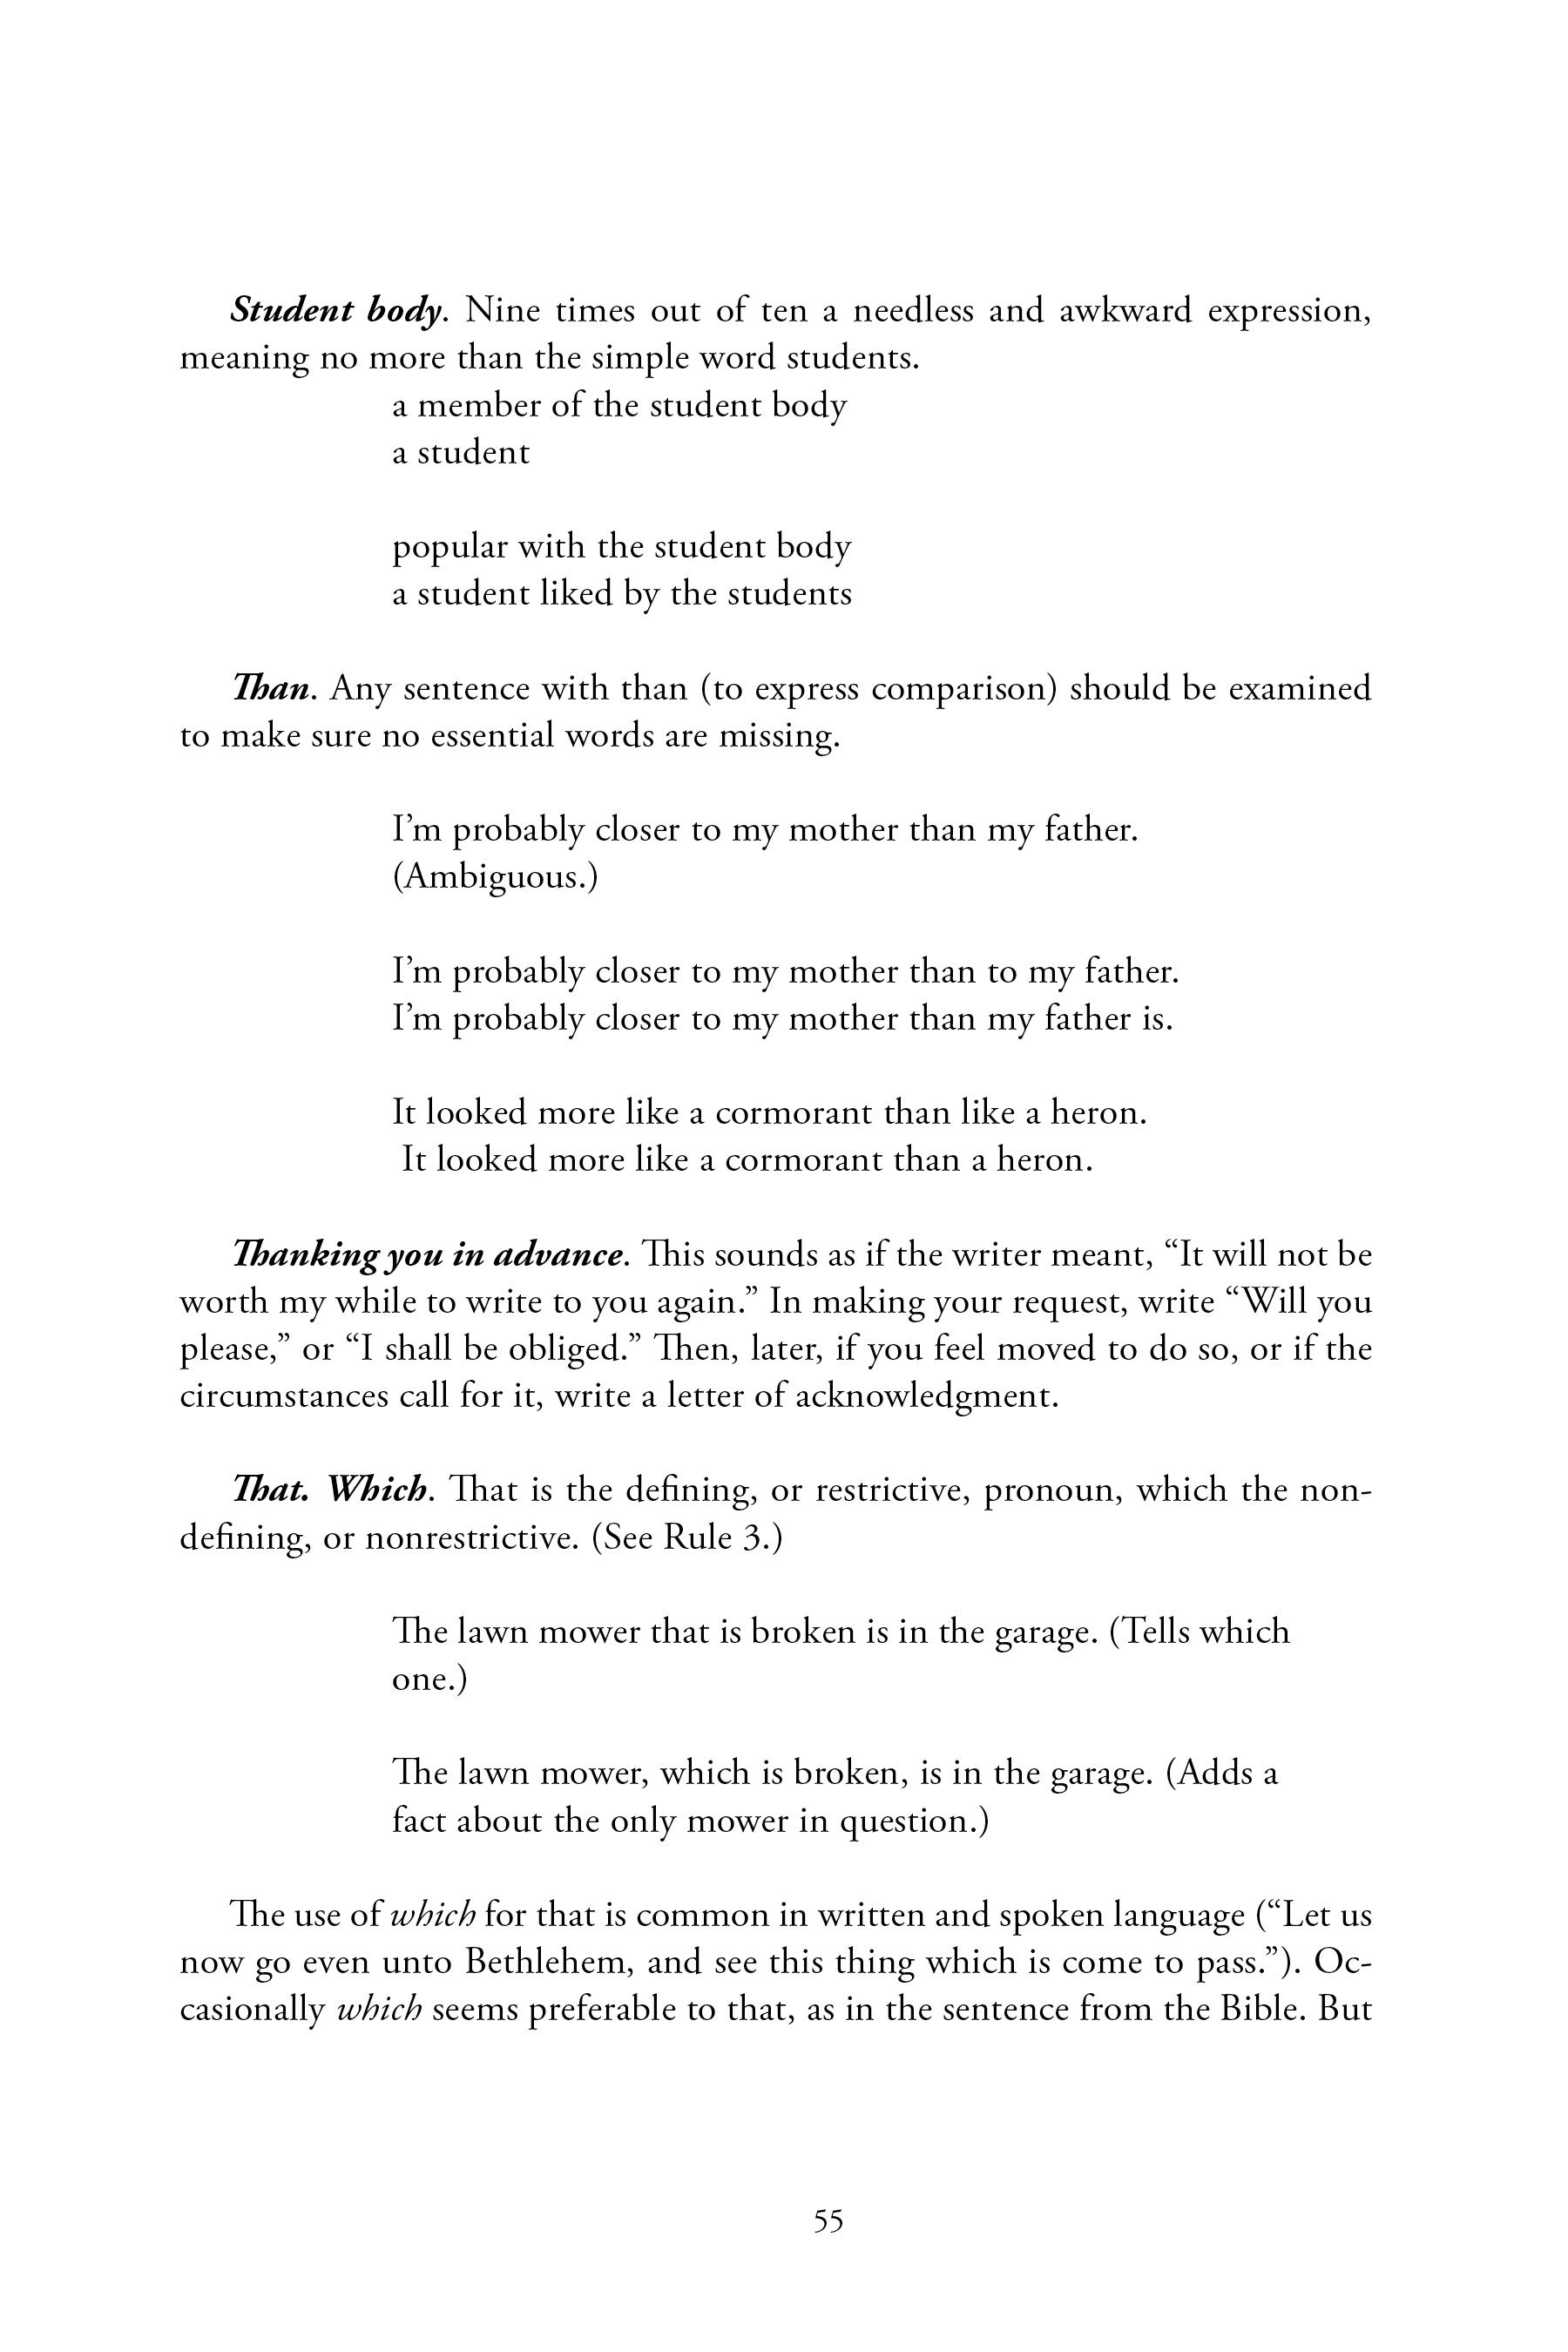 Complete Book71.jpg